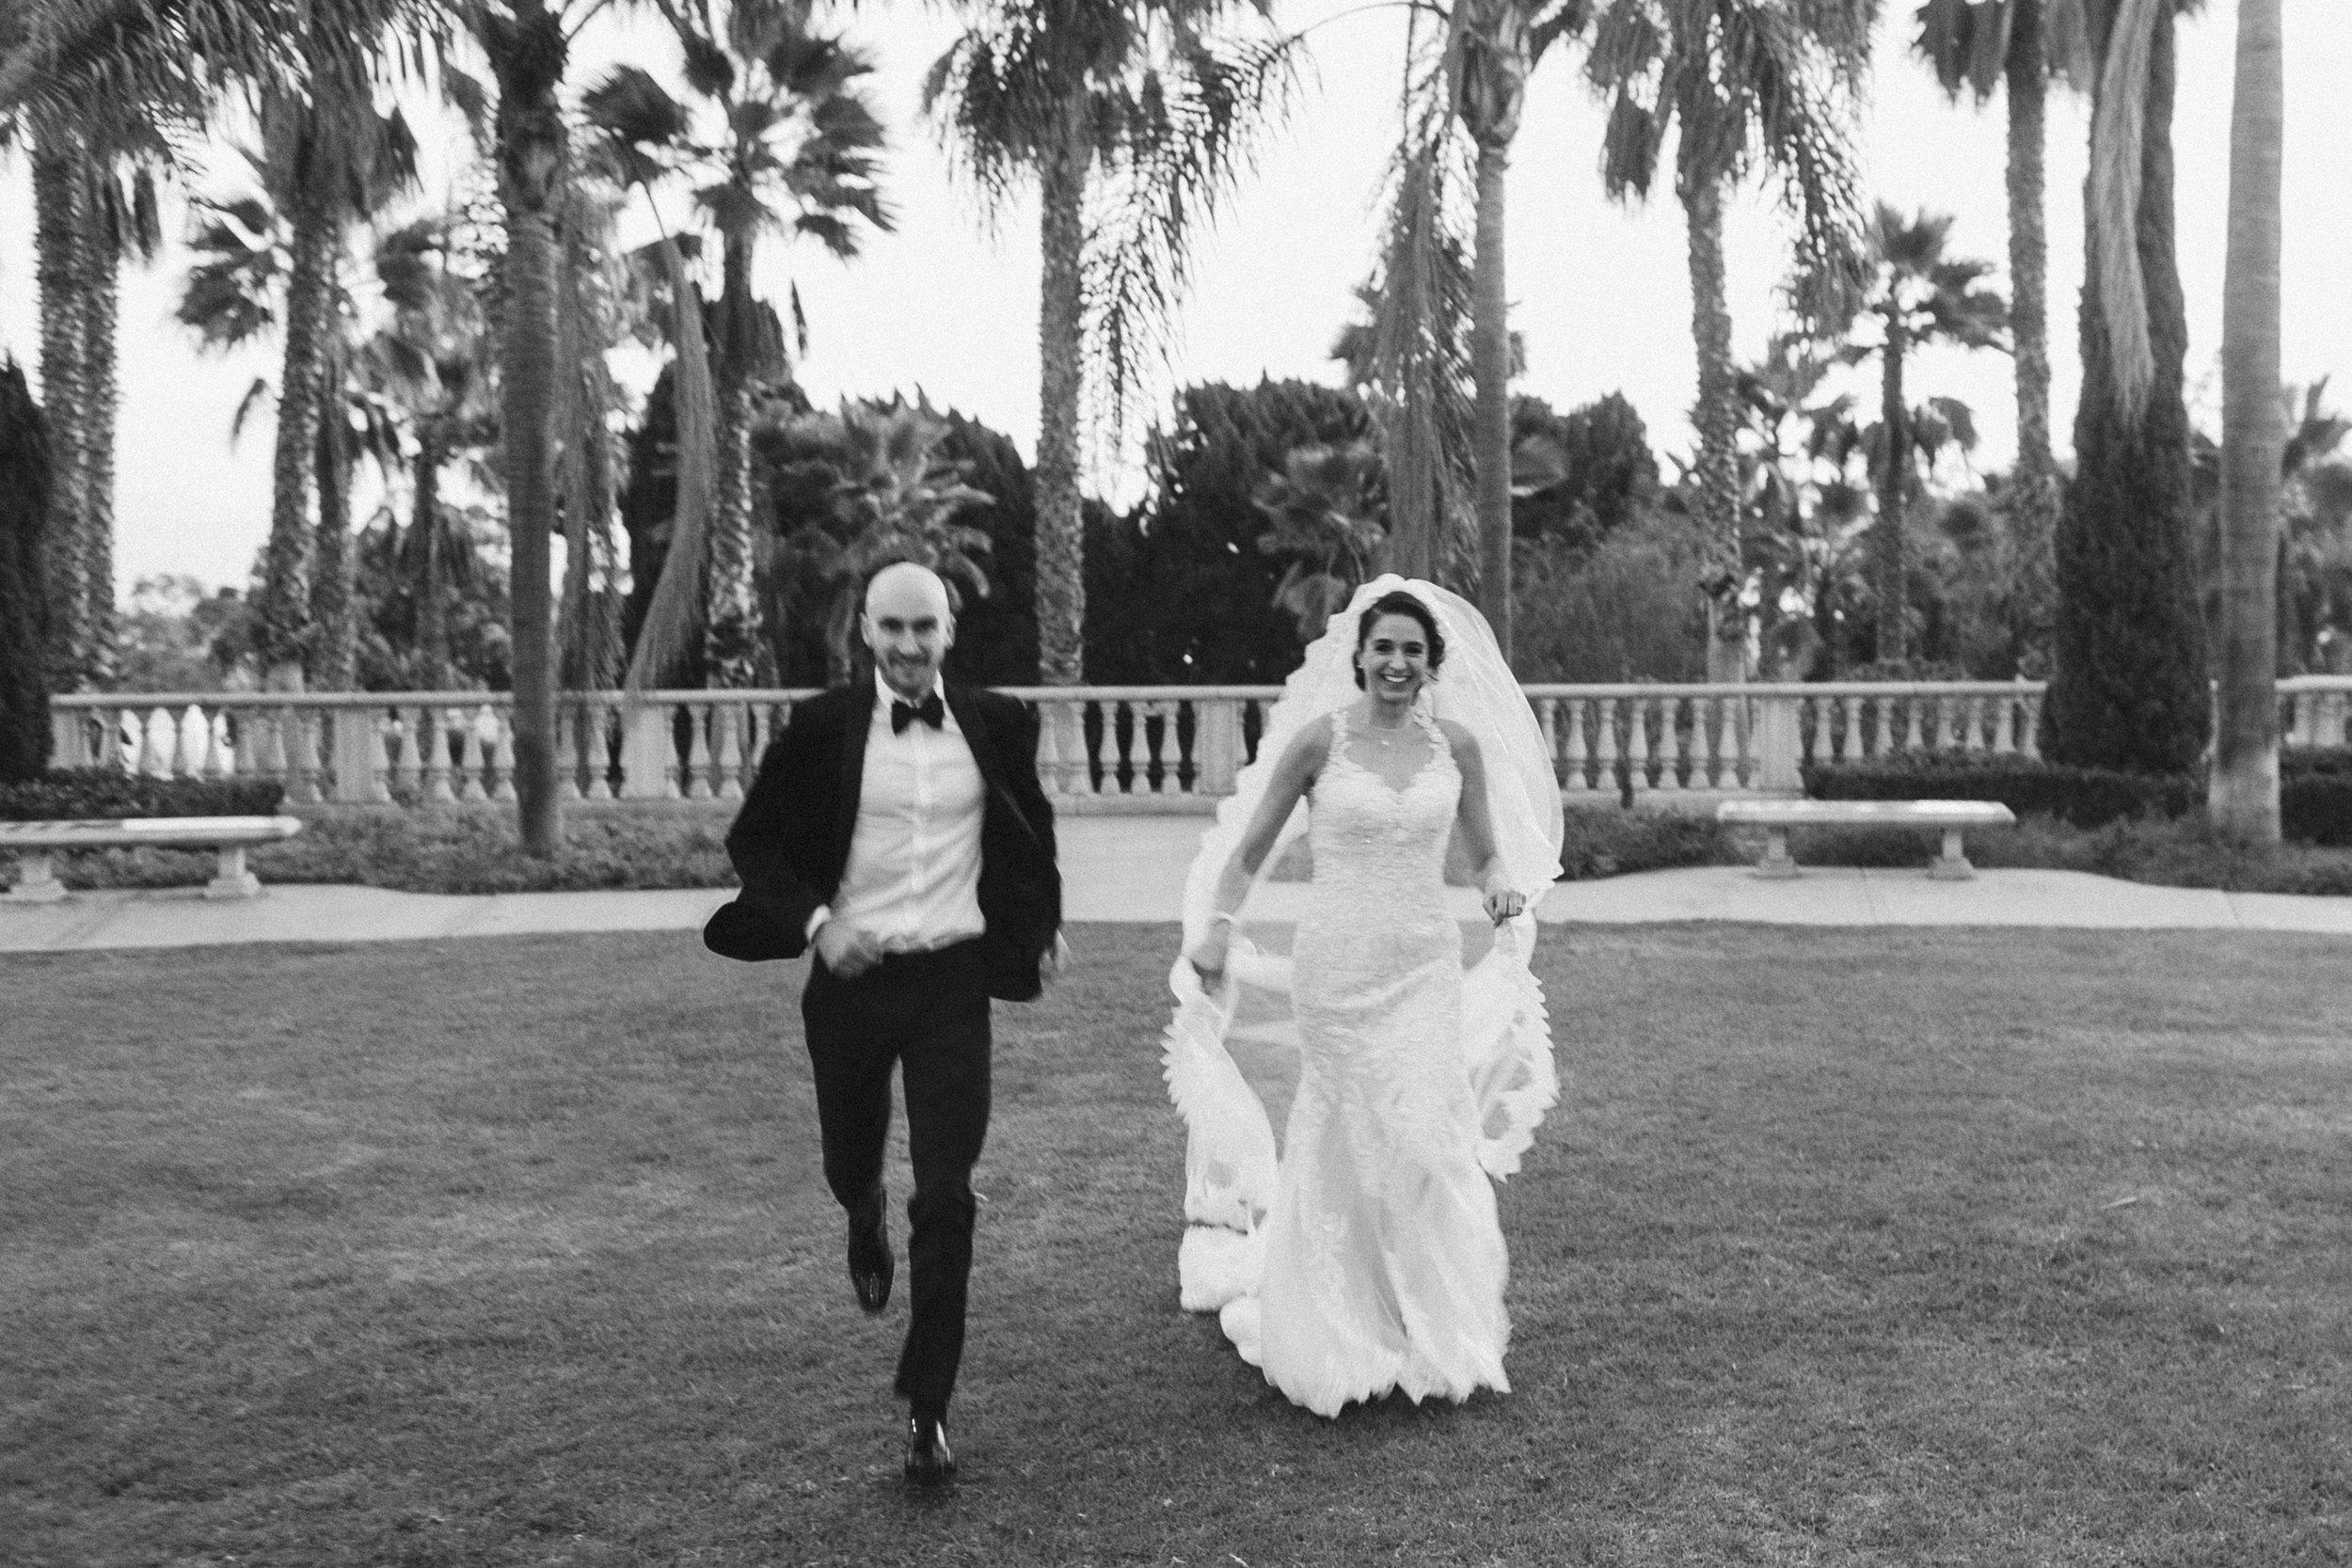 I now pronounce you husband & wife. Meet the RUNDERWOODDSSS.